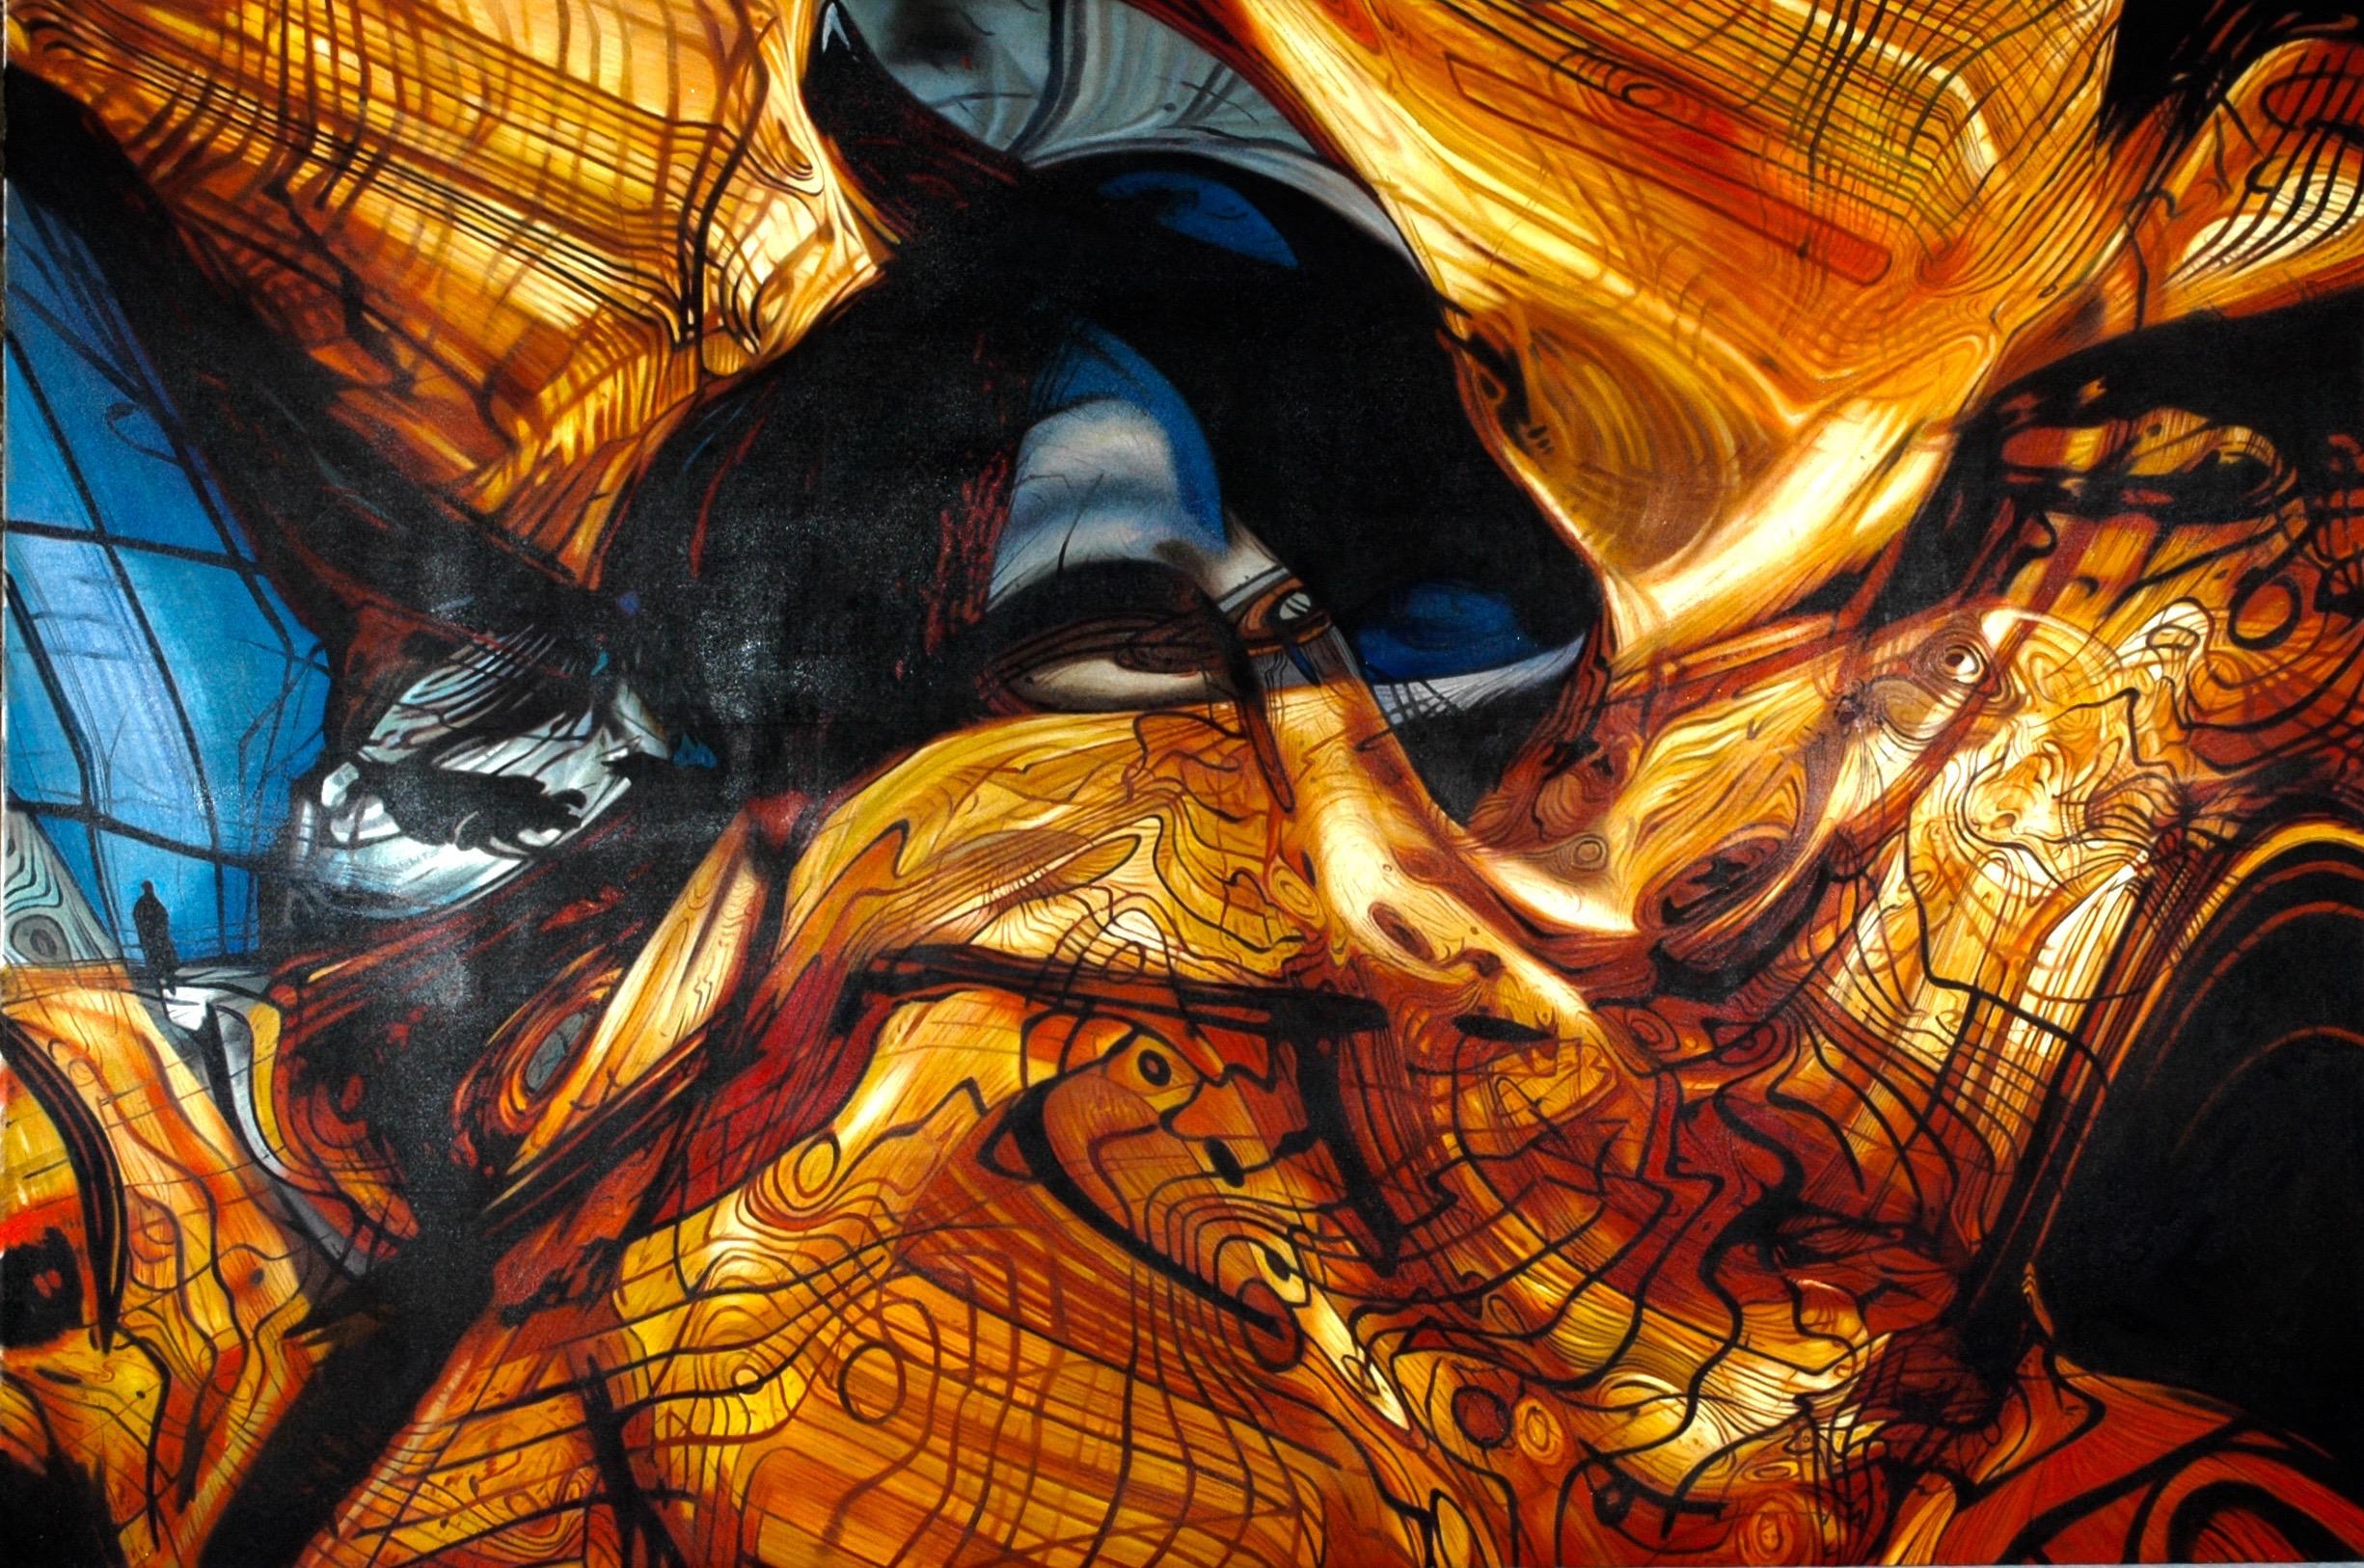 Anamorphic Paintings